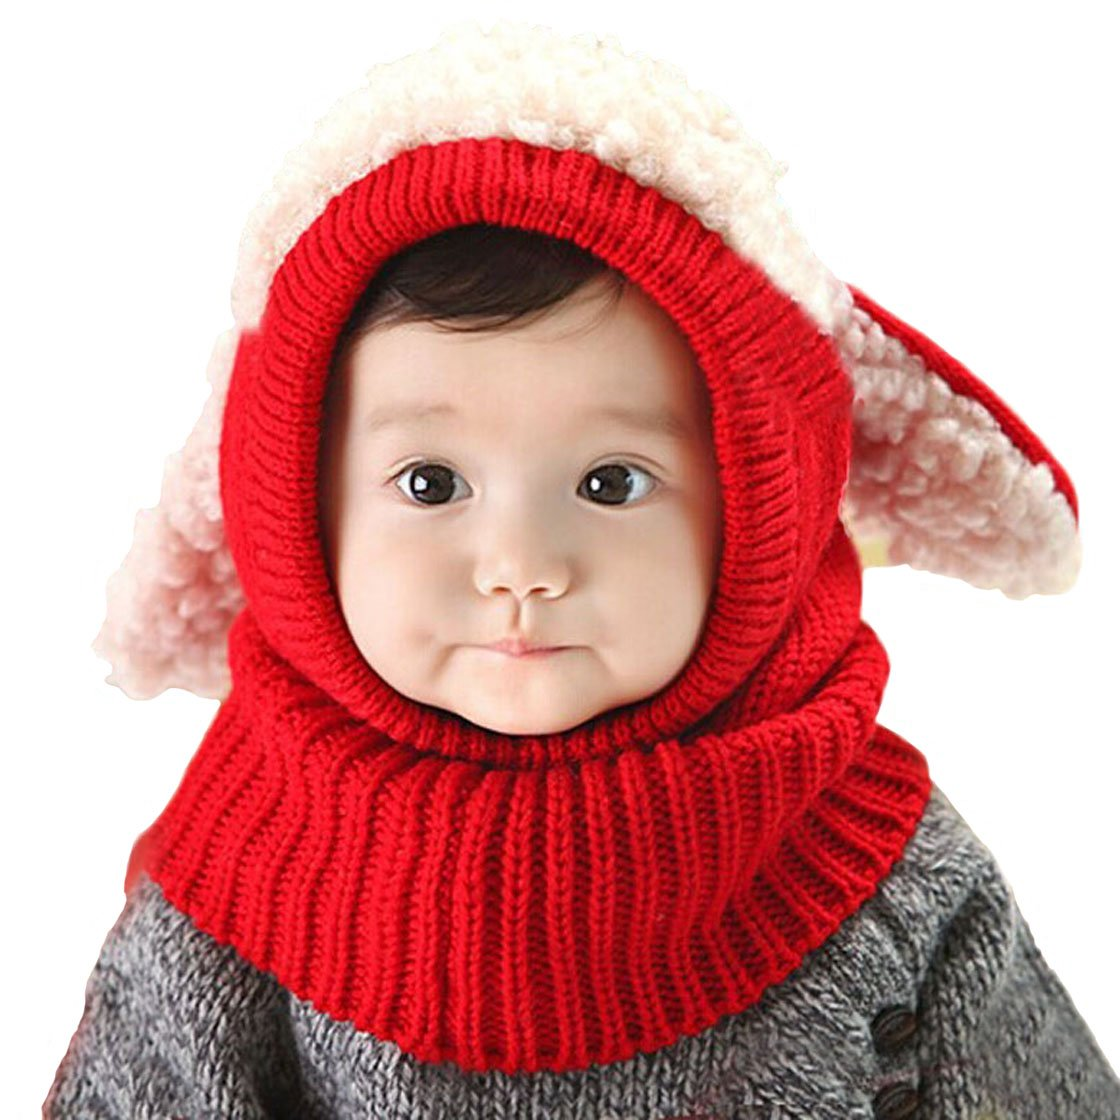 King Star Toddler Baby Kids Girls Winter Warm Woolen Scarf Caps Hooded Hats H6101201-4